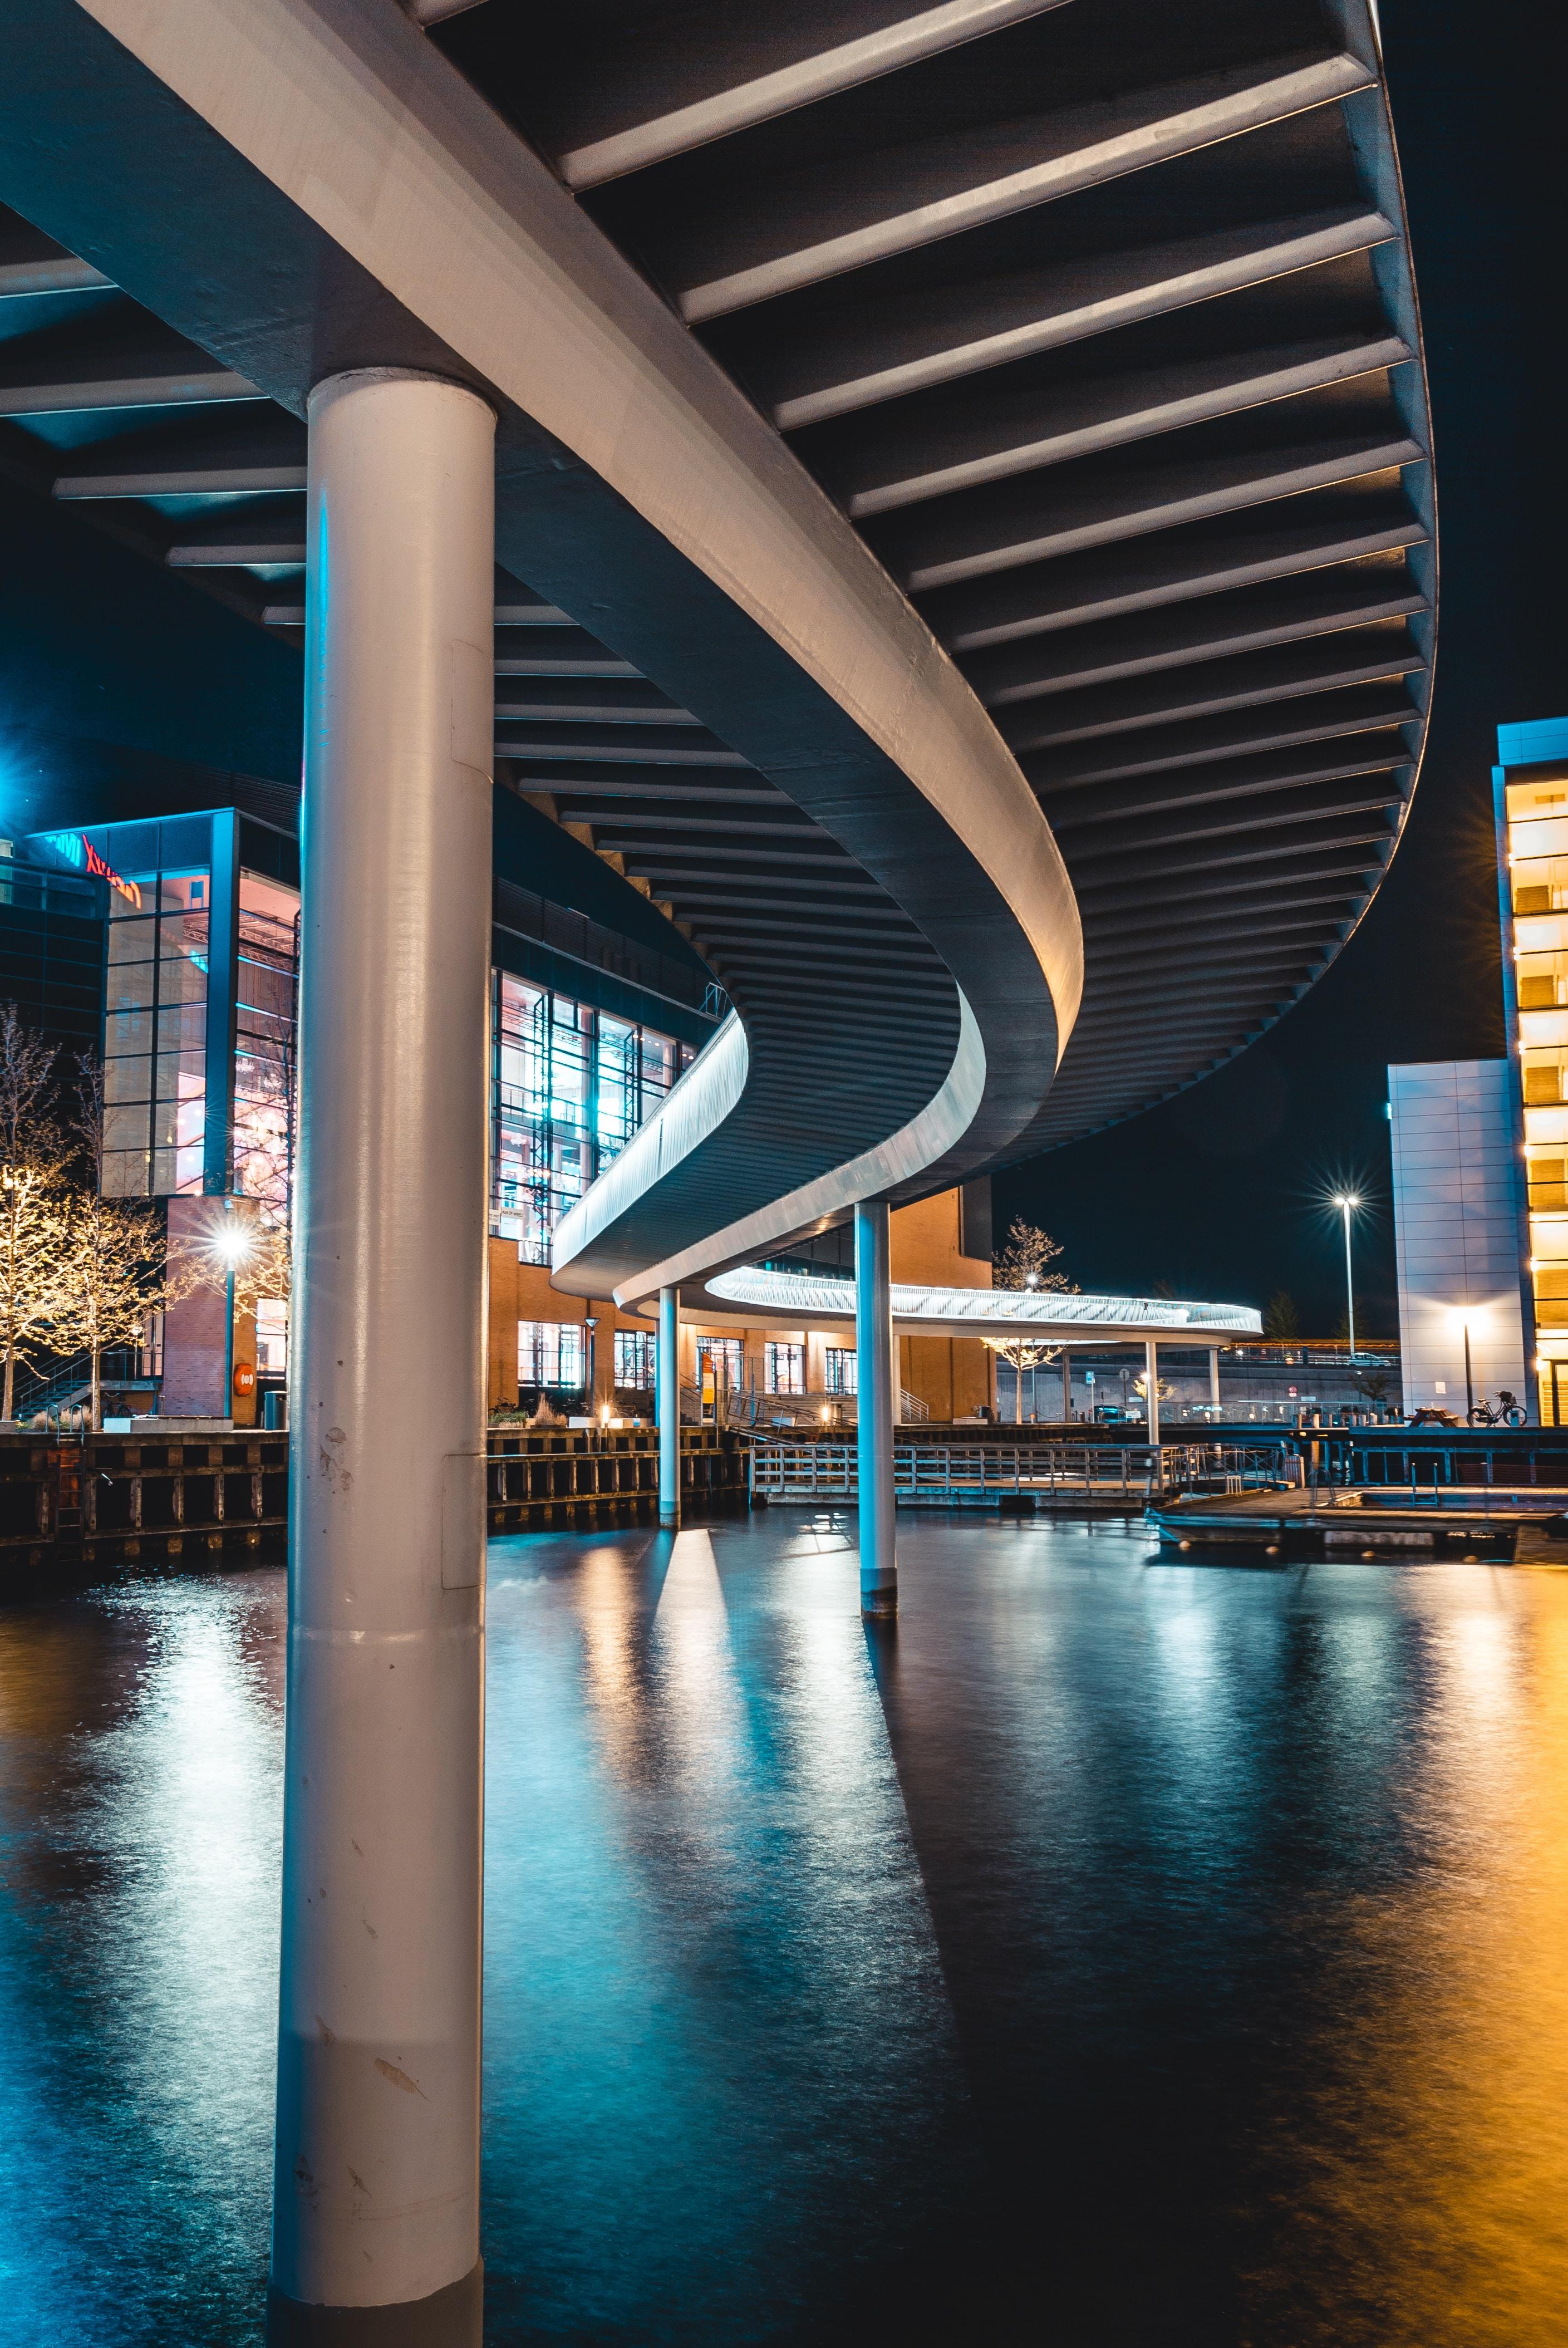 nighttime scenery of buildings